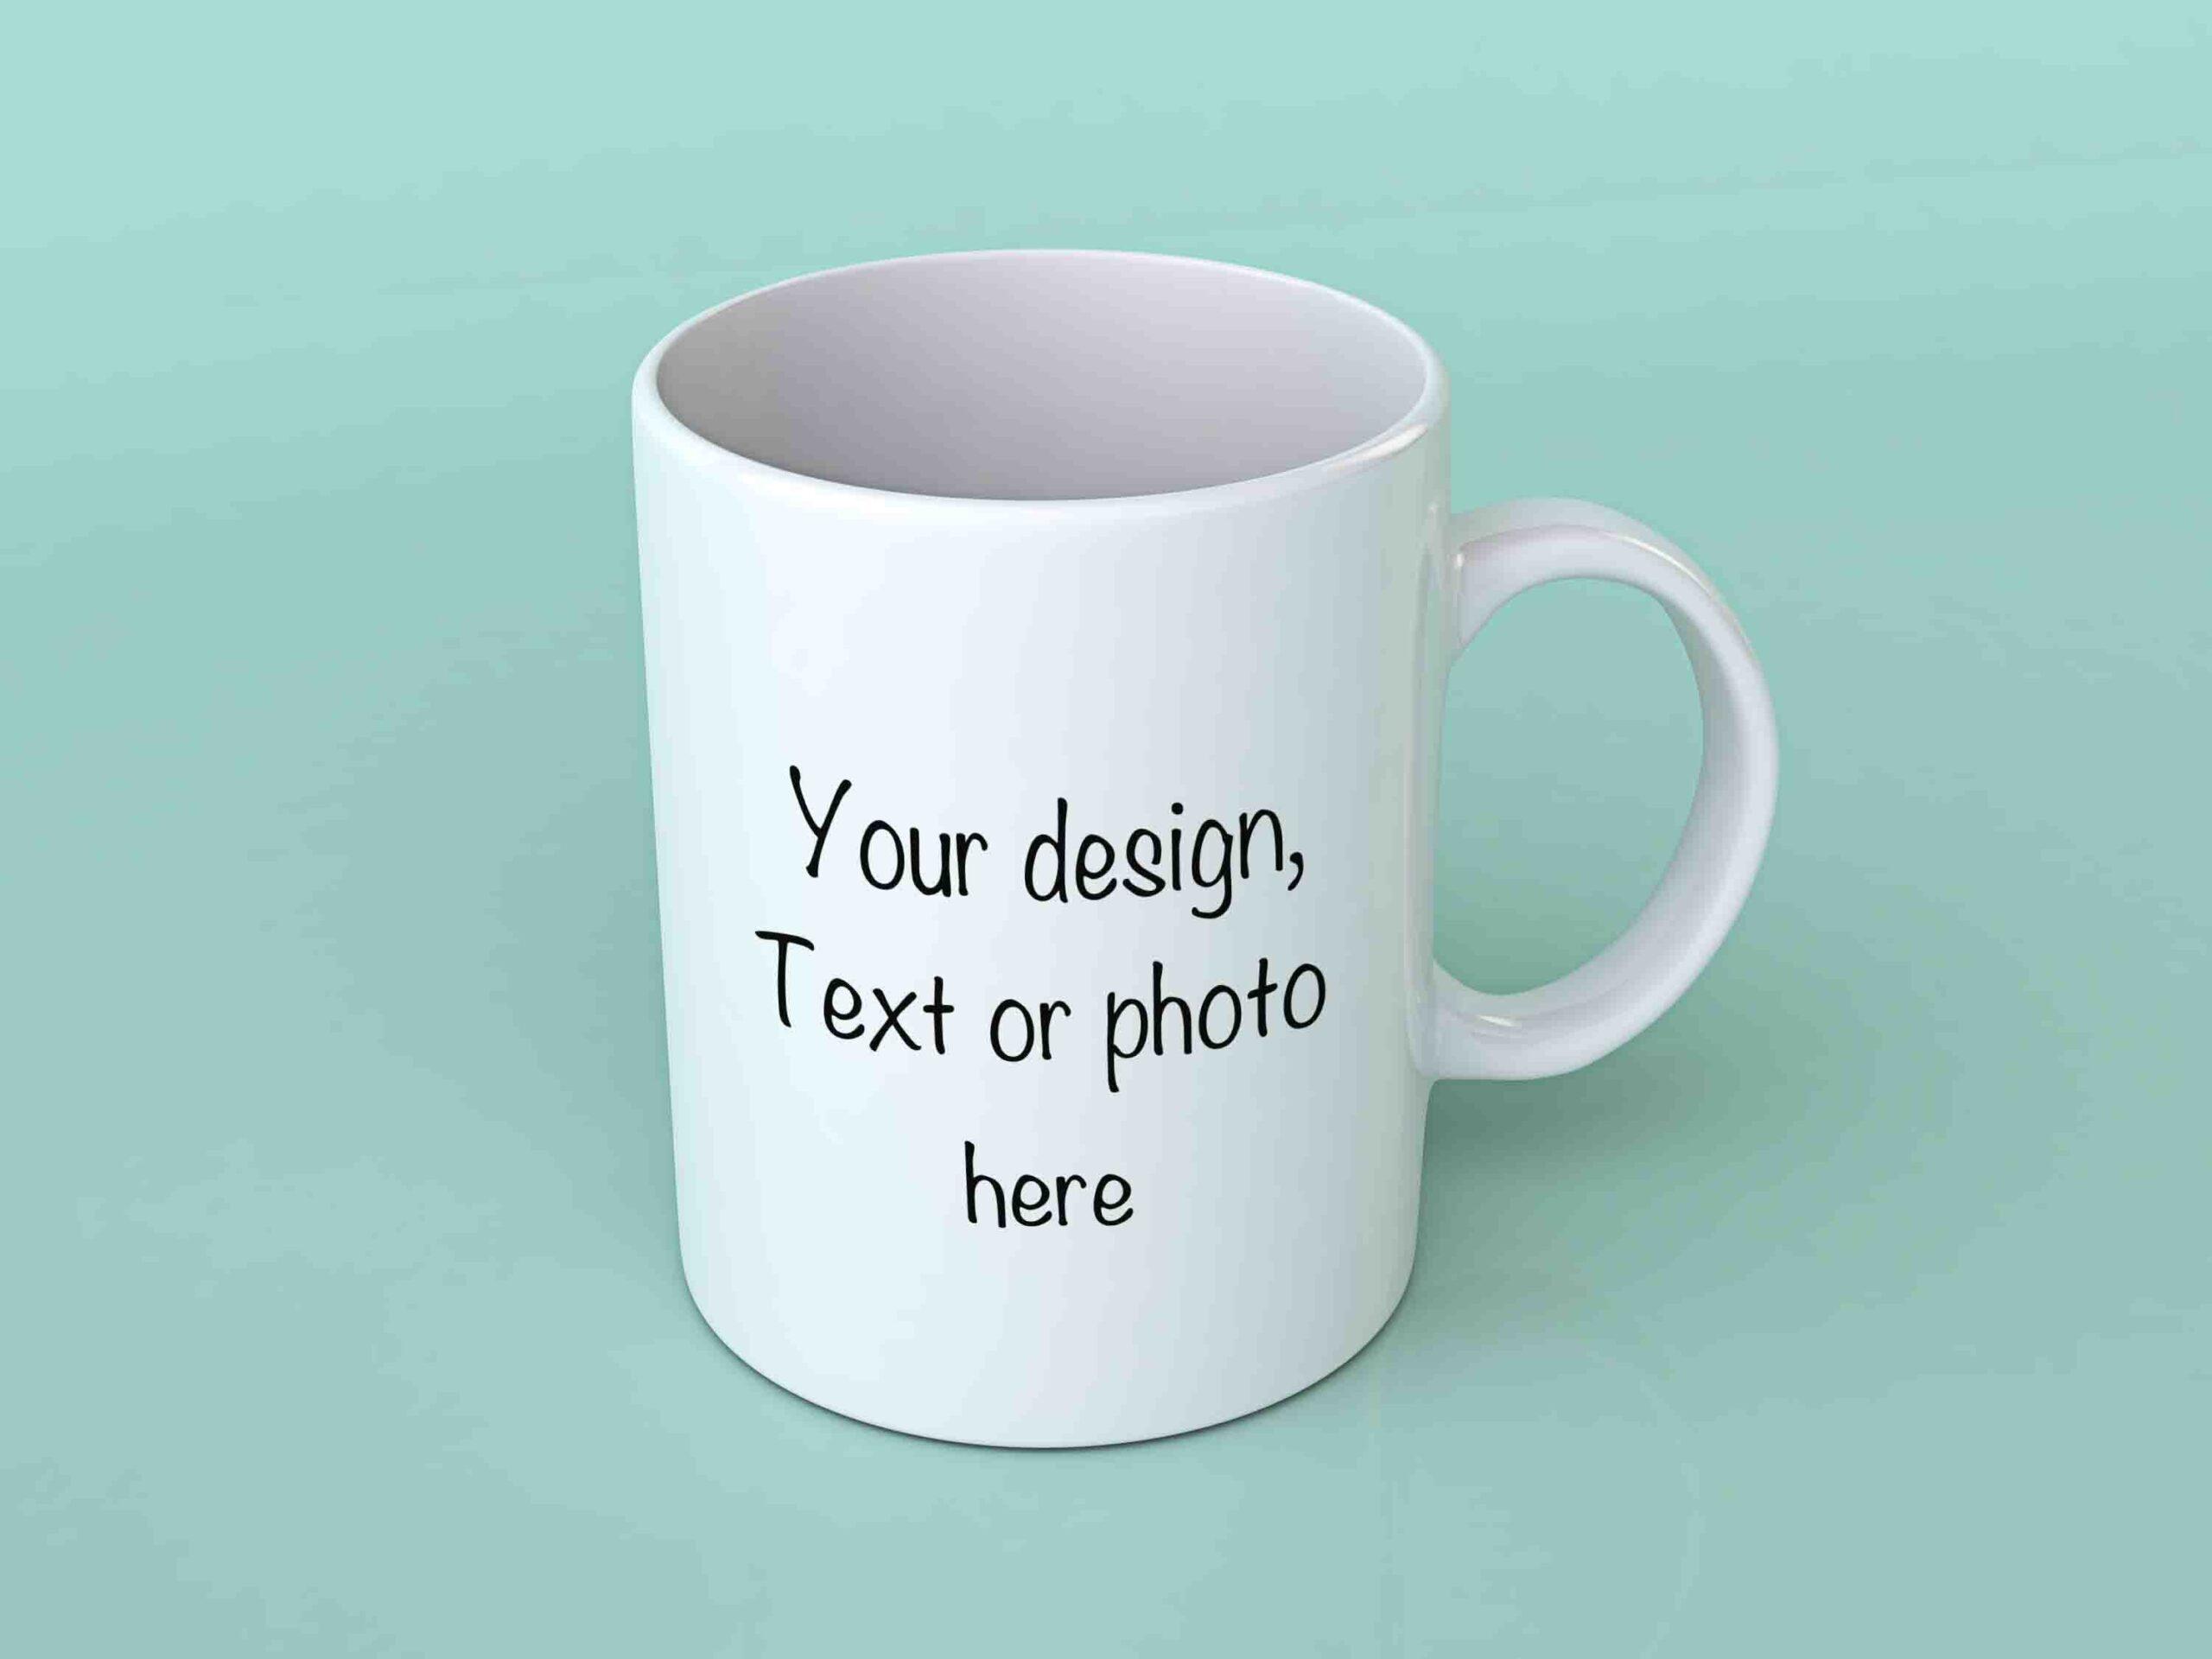 Custom printed coffee mugs